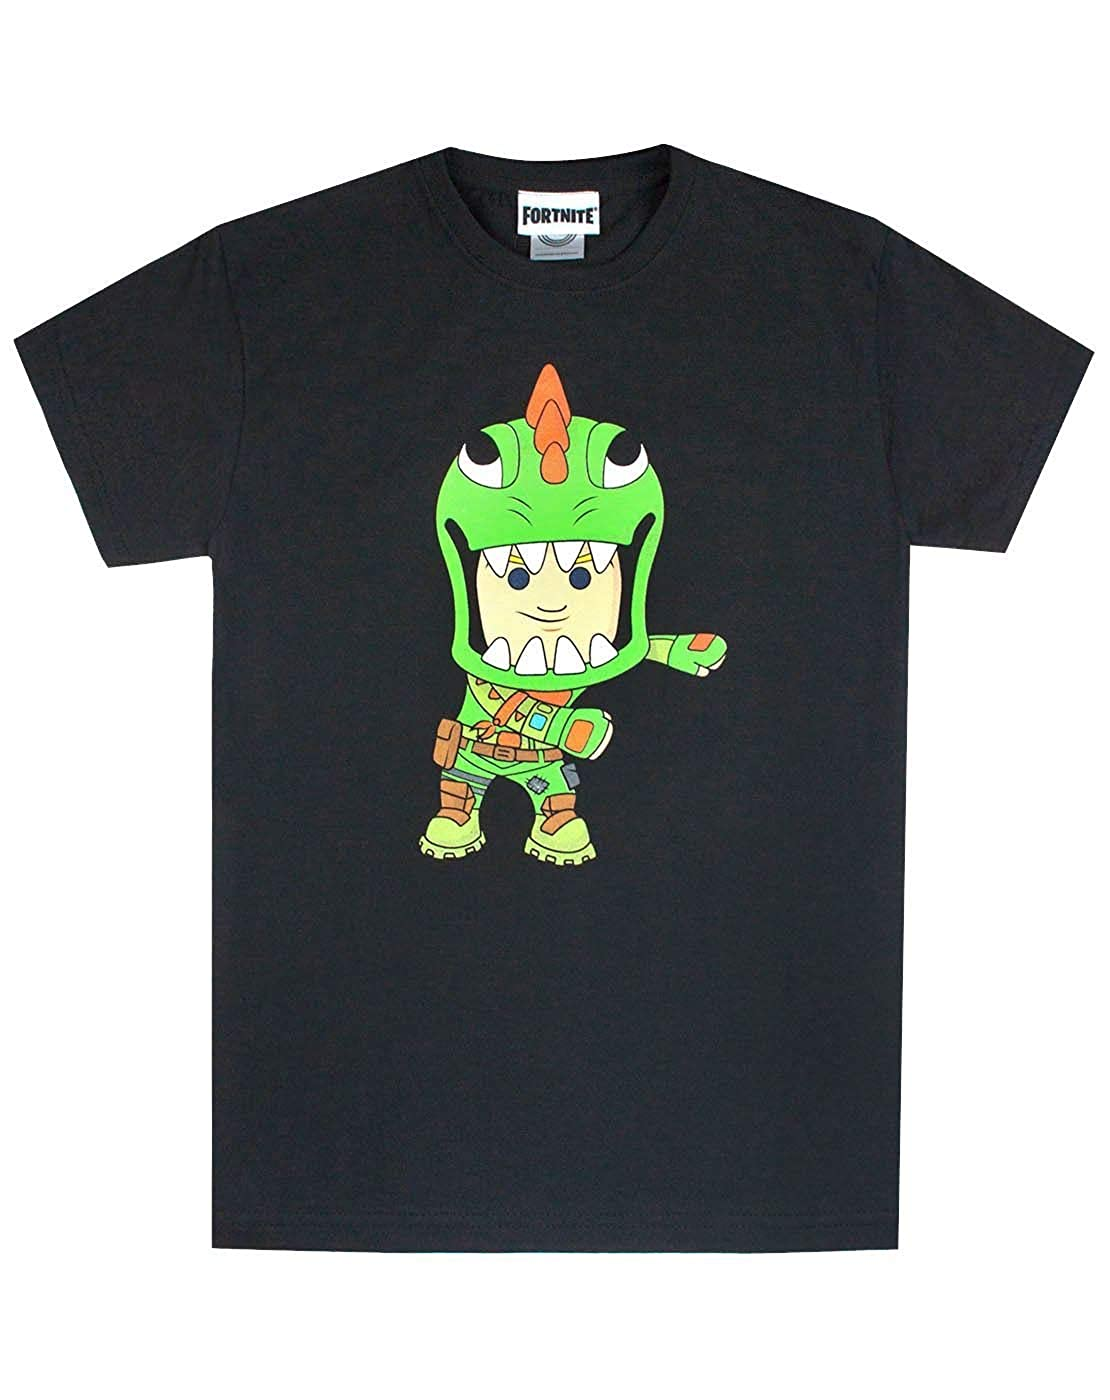 Amazon.com: Fortnite Rex Floss Black T-Shirt (14-15 Years ...